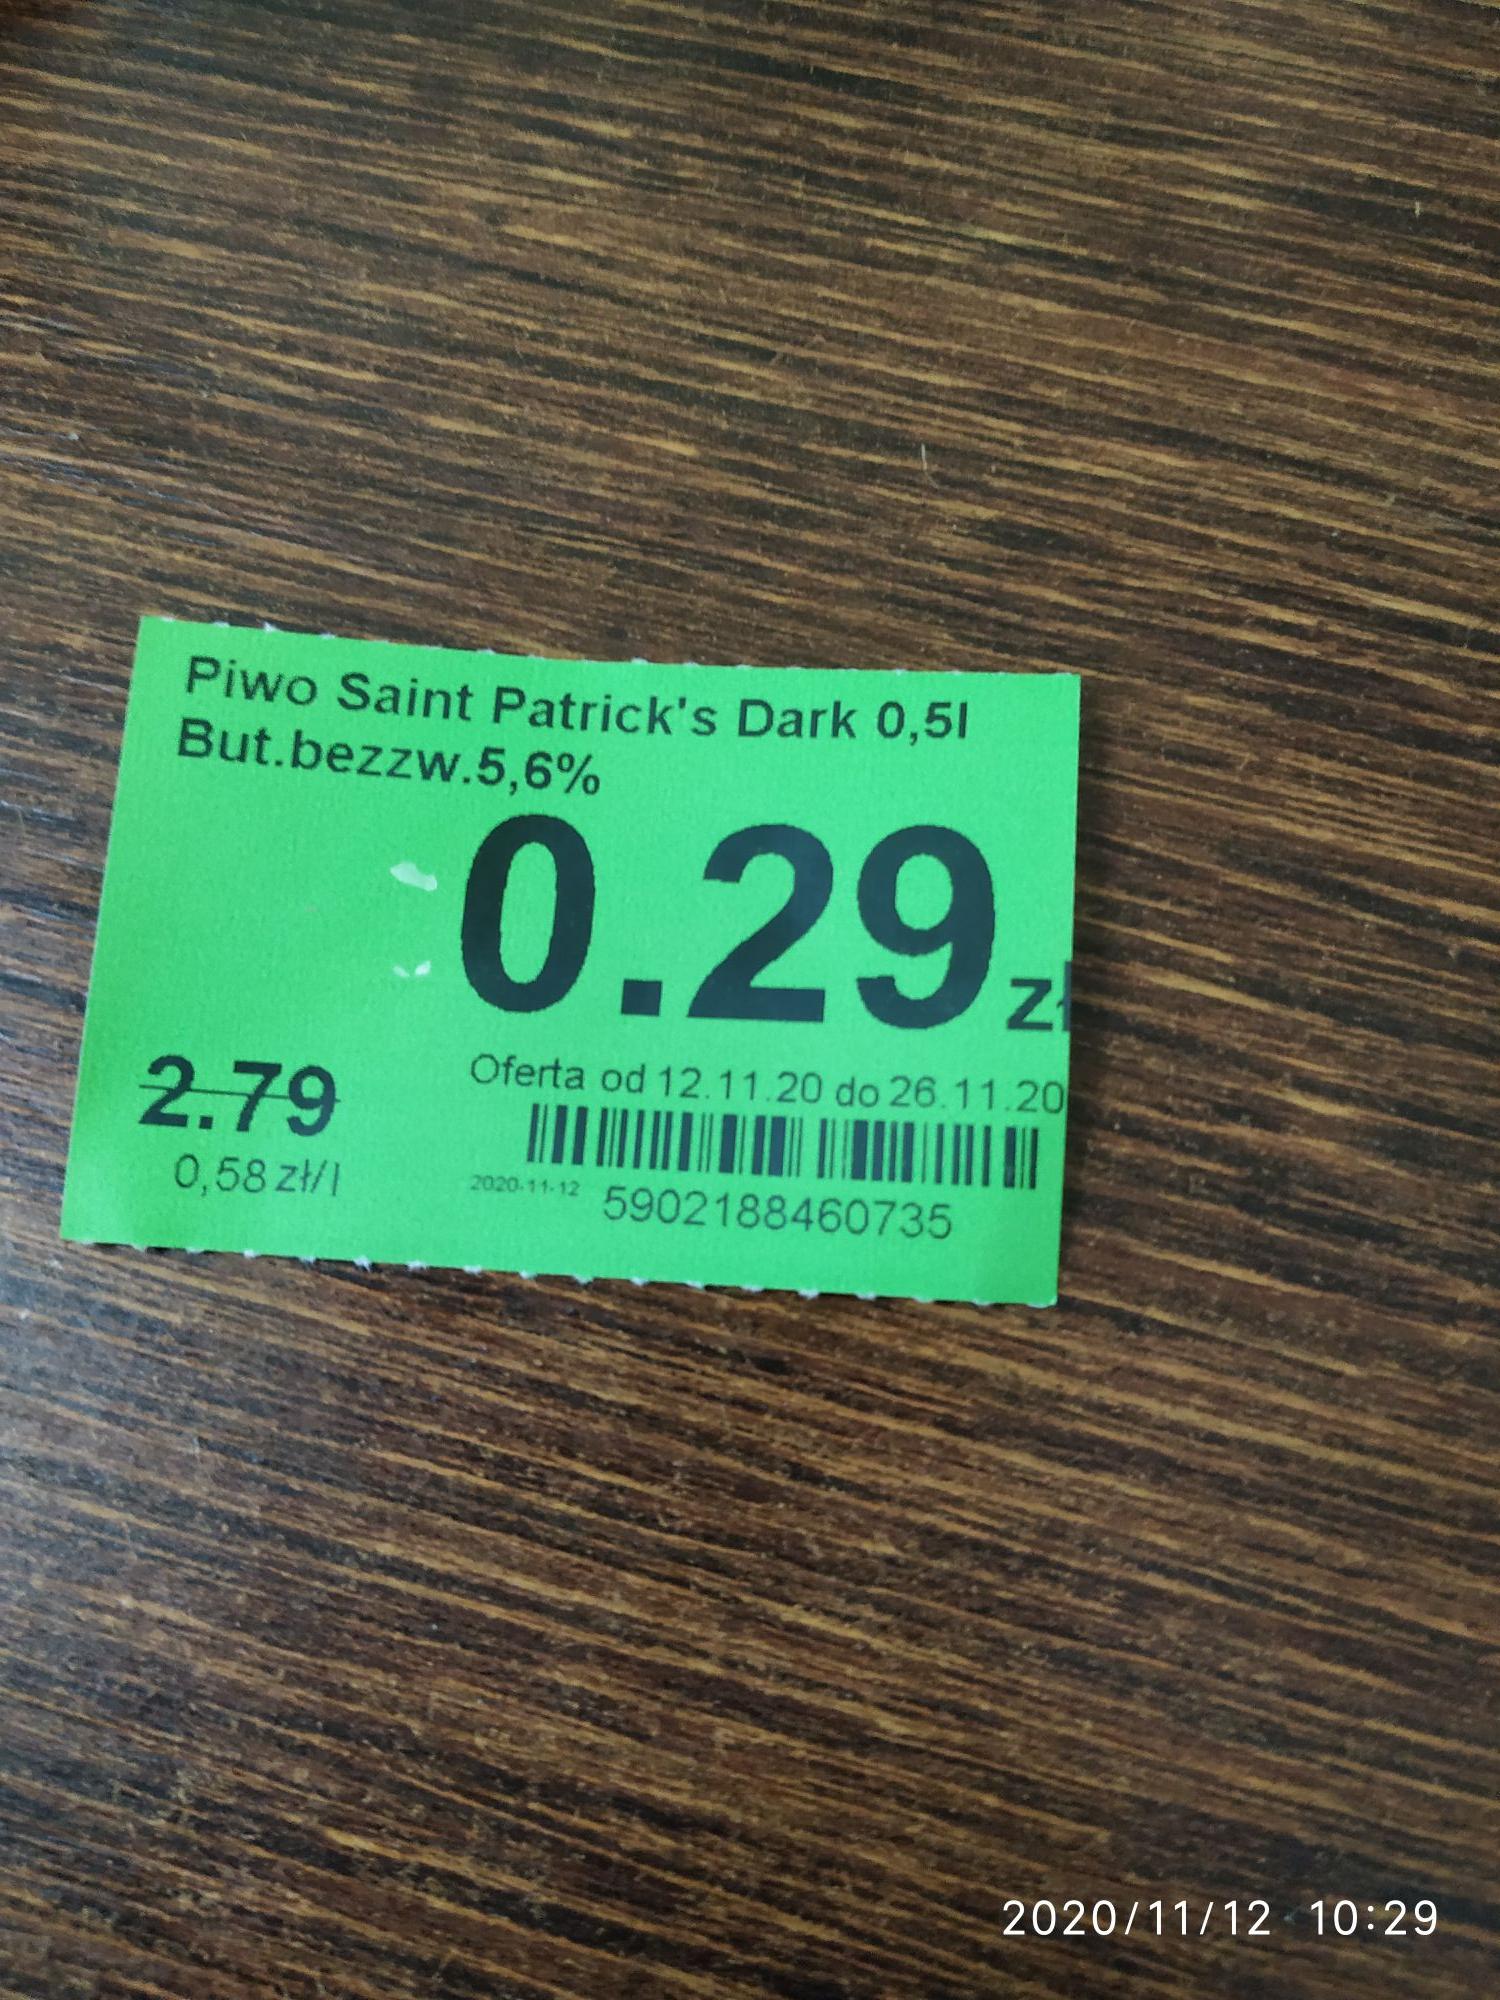 Piwo Saint Patrick's Dark w Dino